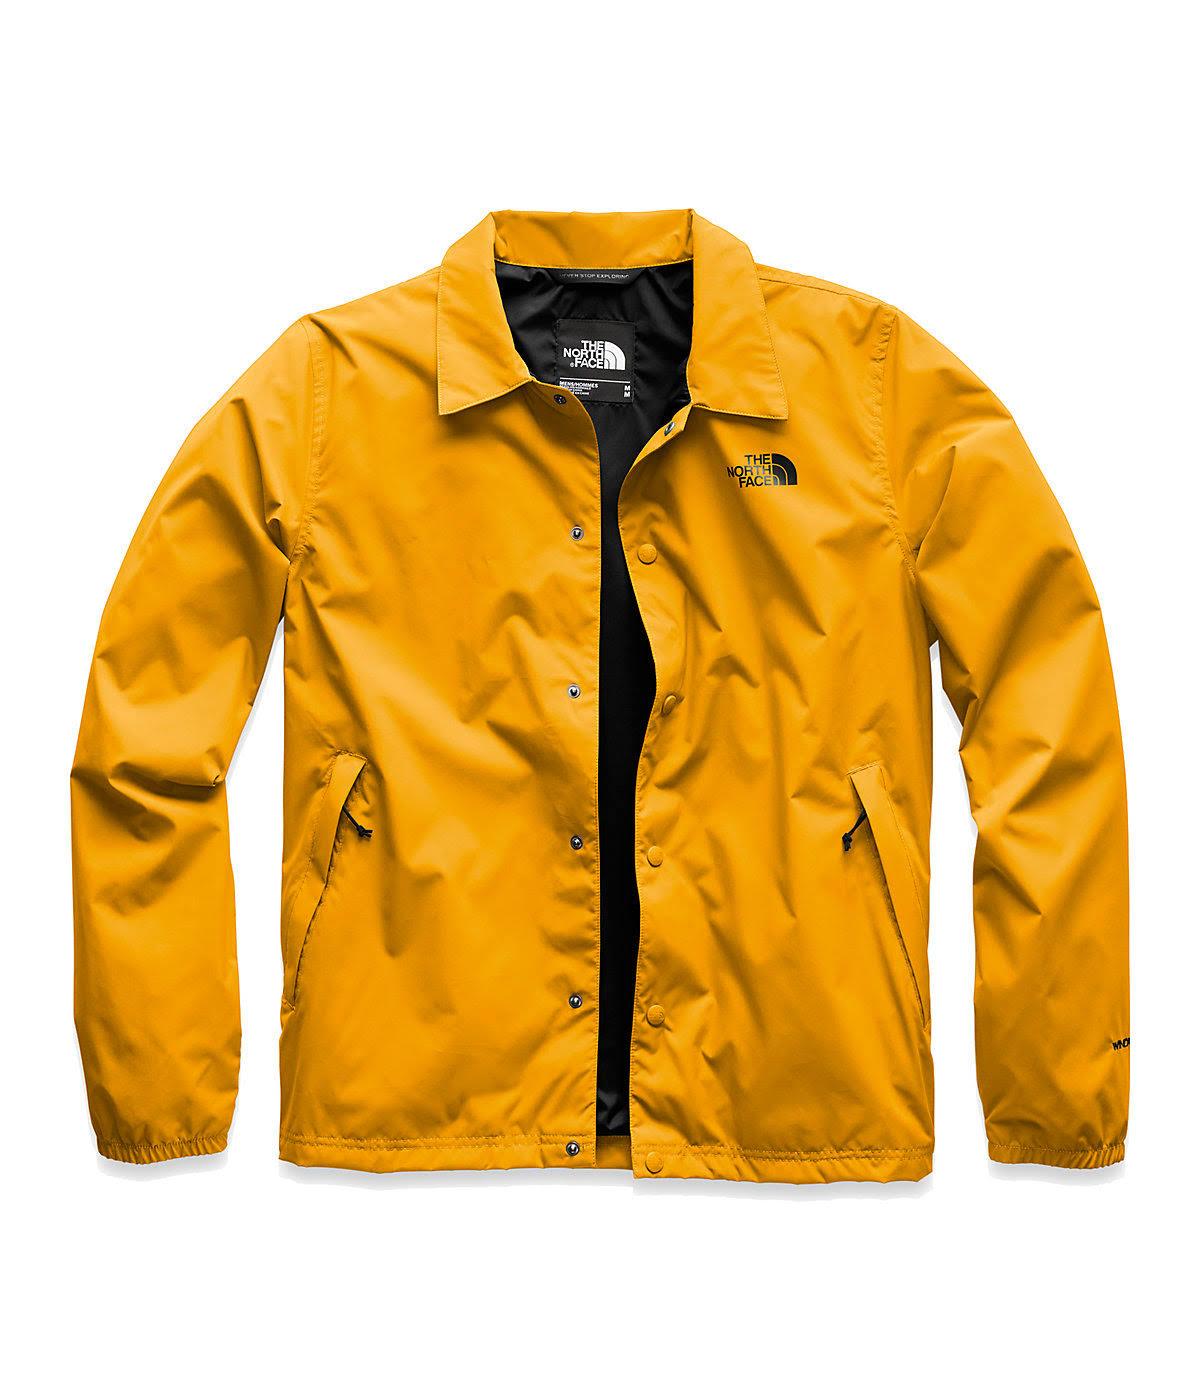 Tnf Medio De Packable Para North Entrenadores Zinnia The Face Orange Hombre Chaqueta tamaño BvtRq5xwB